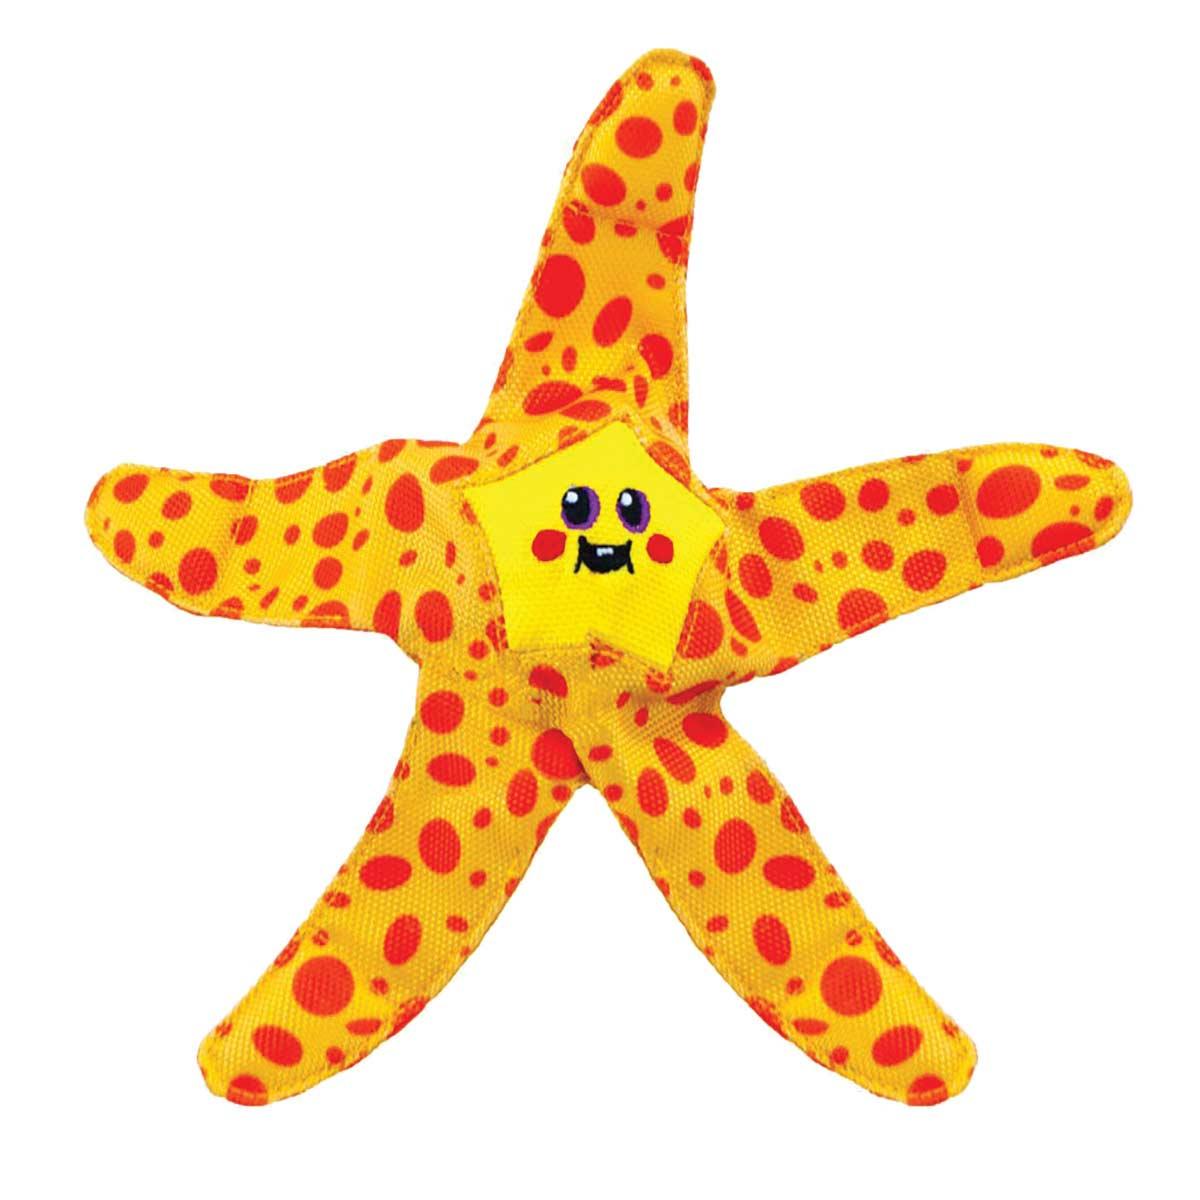 Outward Hound Floatiez Floppy Starfish Dog Toy